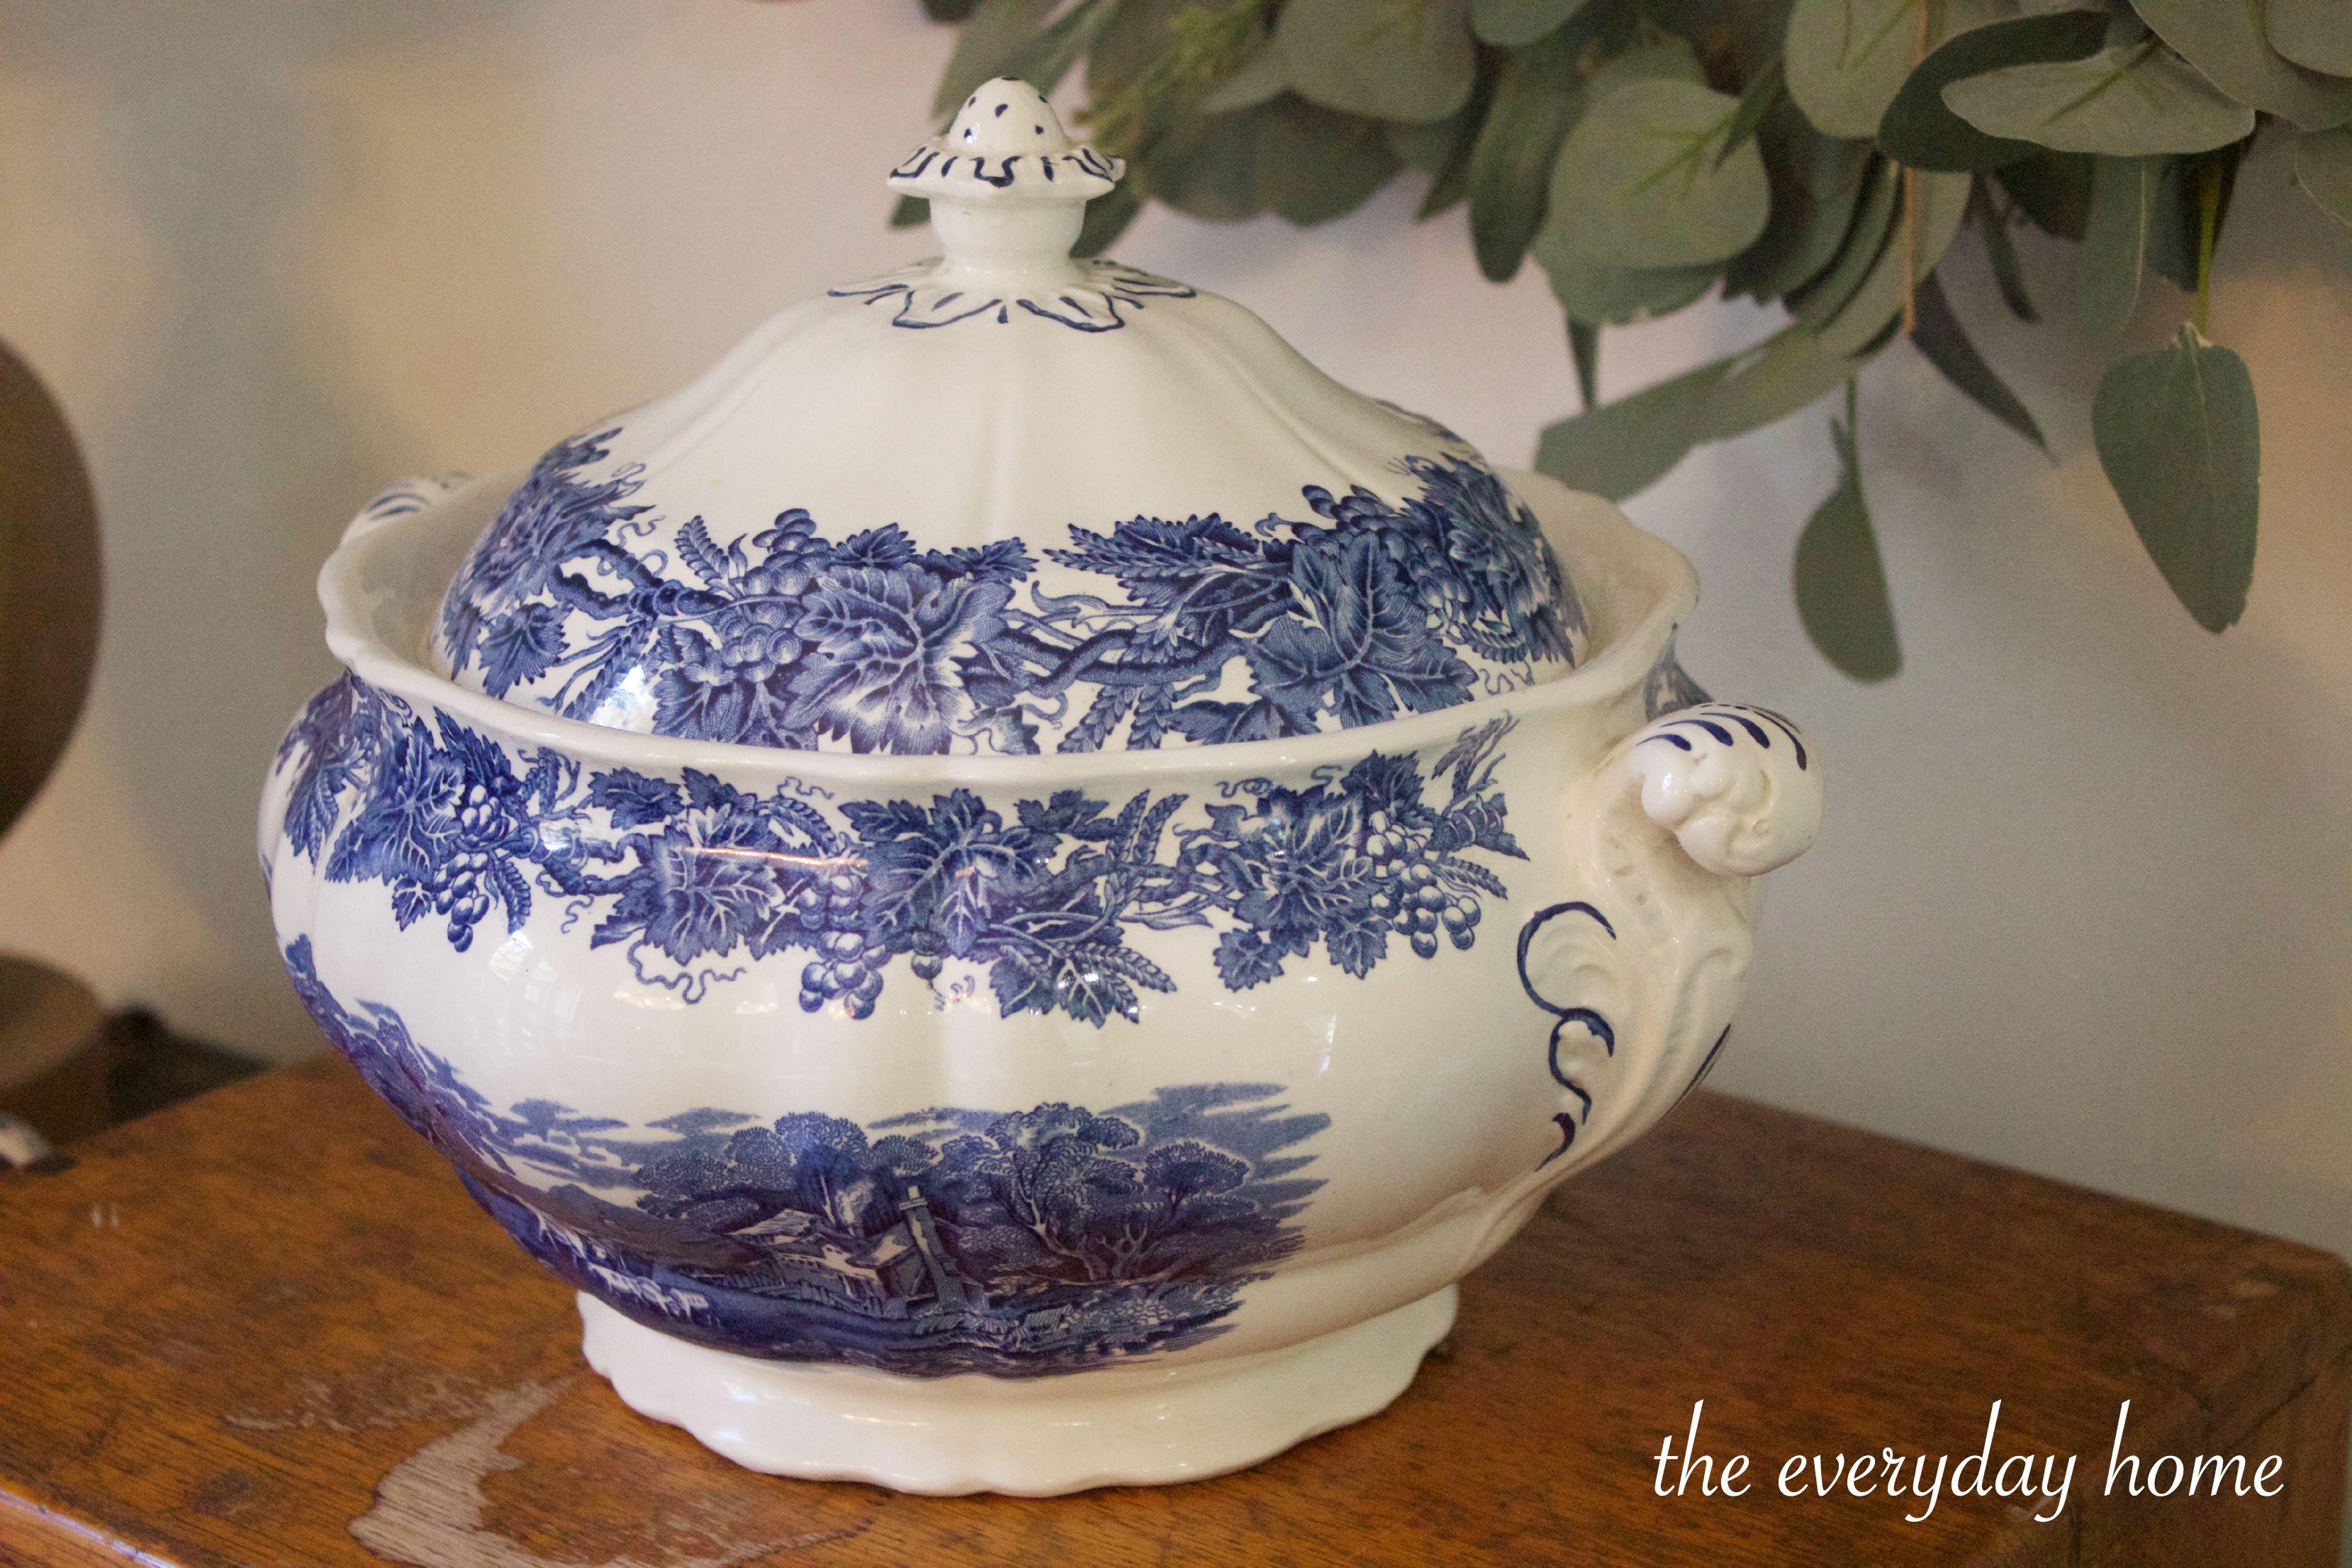 English Soup Tureen | The Everyday Home | www.everydayhomeblog.com